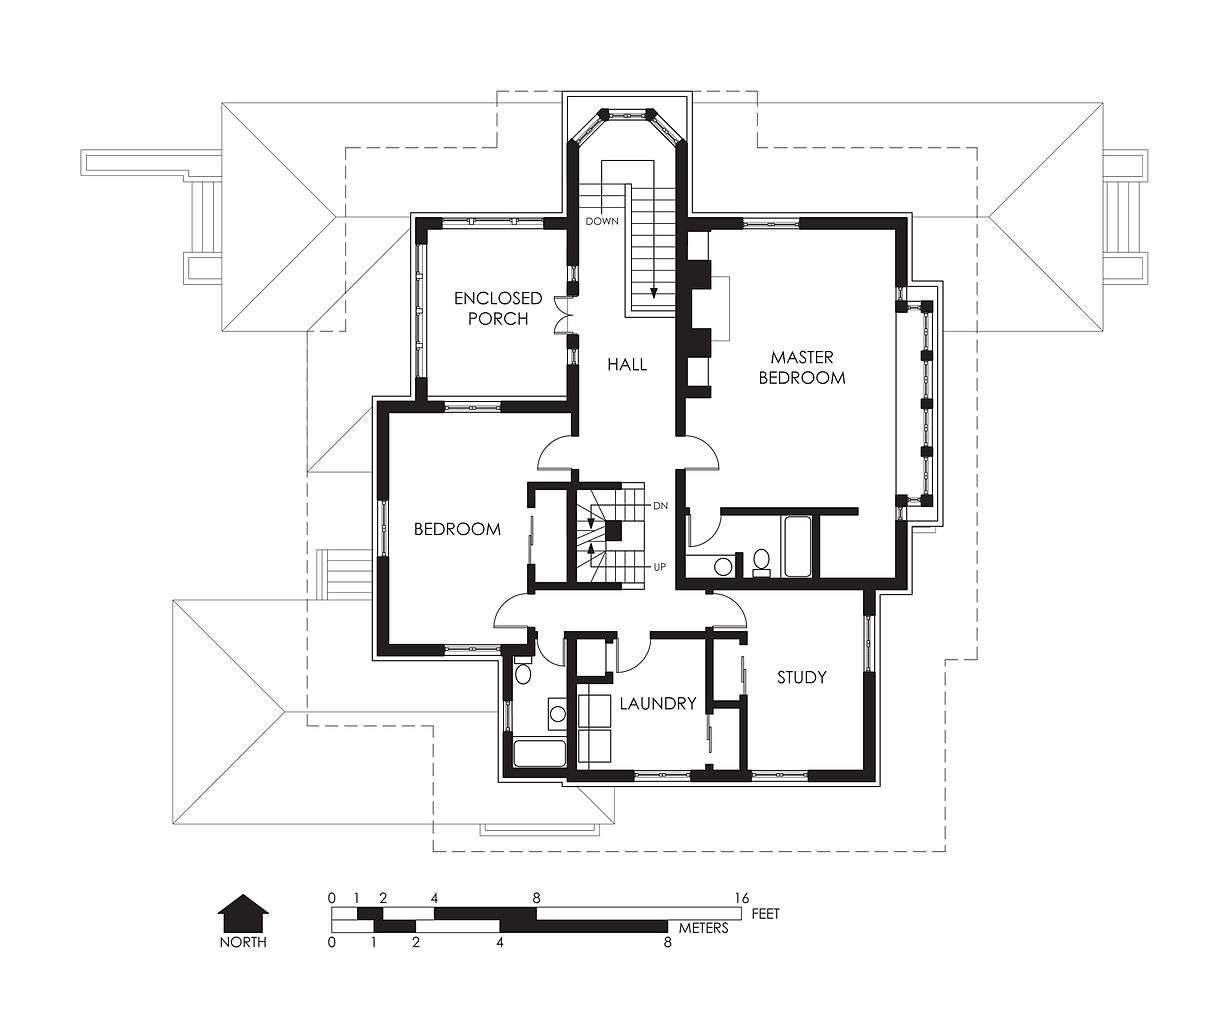 Hills Decaro House Second Floor Plan Wikipedia